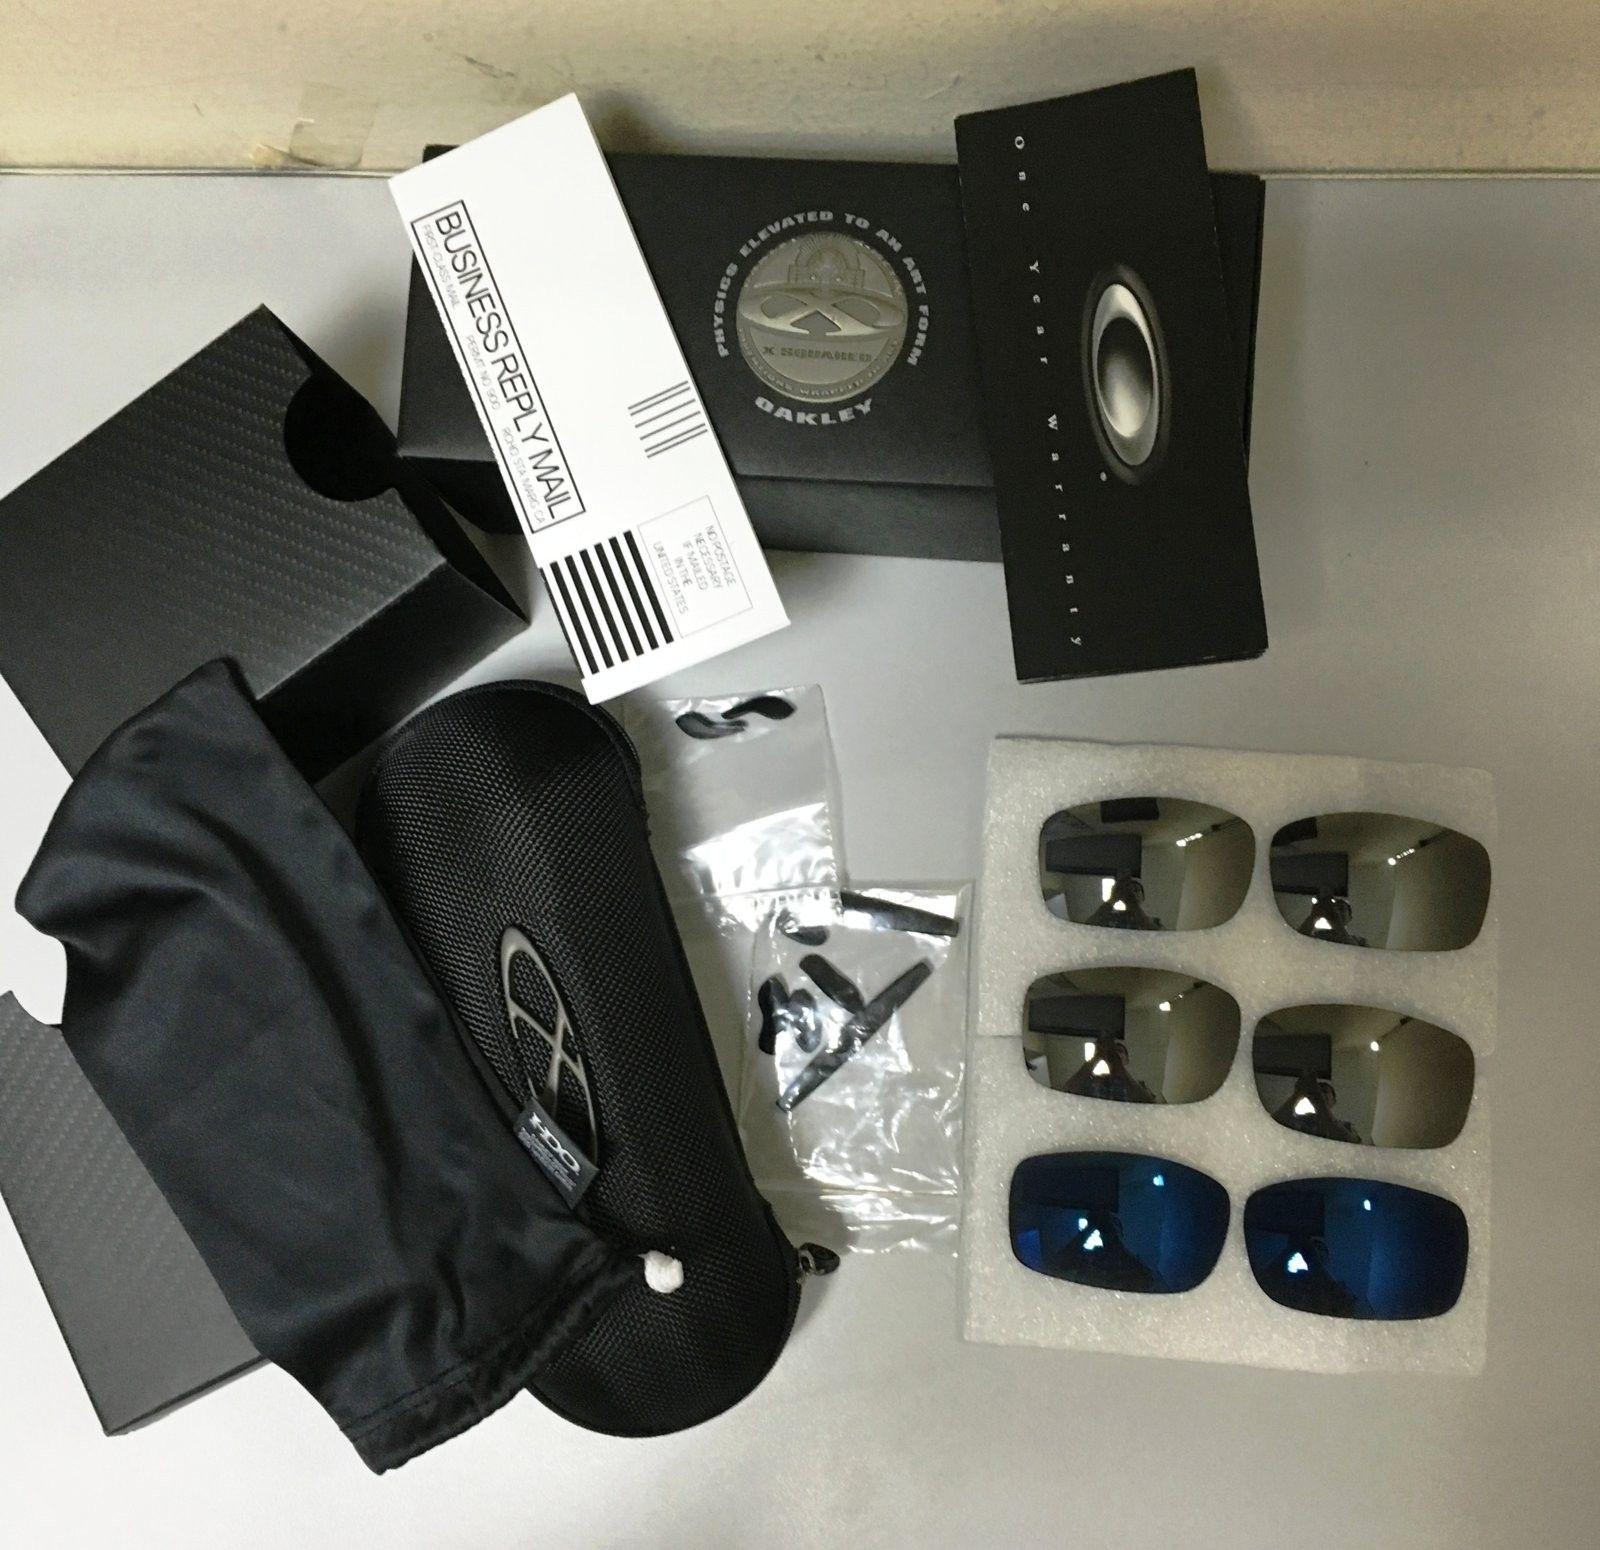 Box for XS Plasma/Ice, XS OEM lenses, XS OEM rubbers - image 3.jpeg